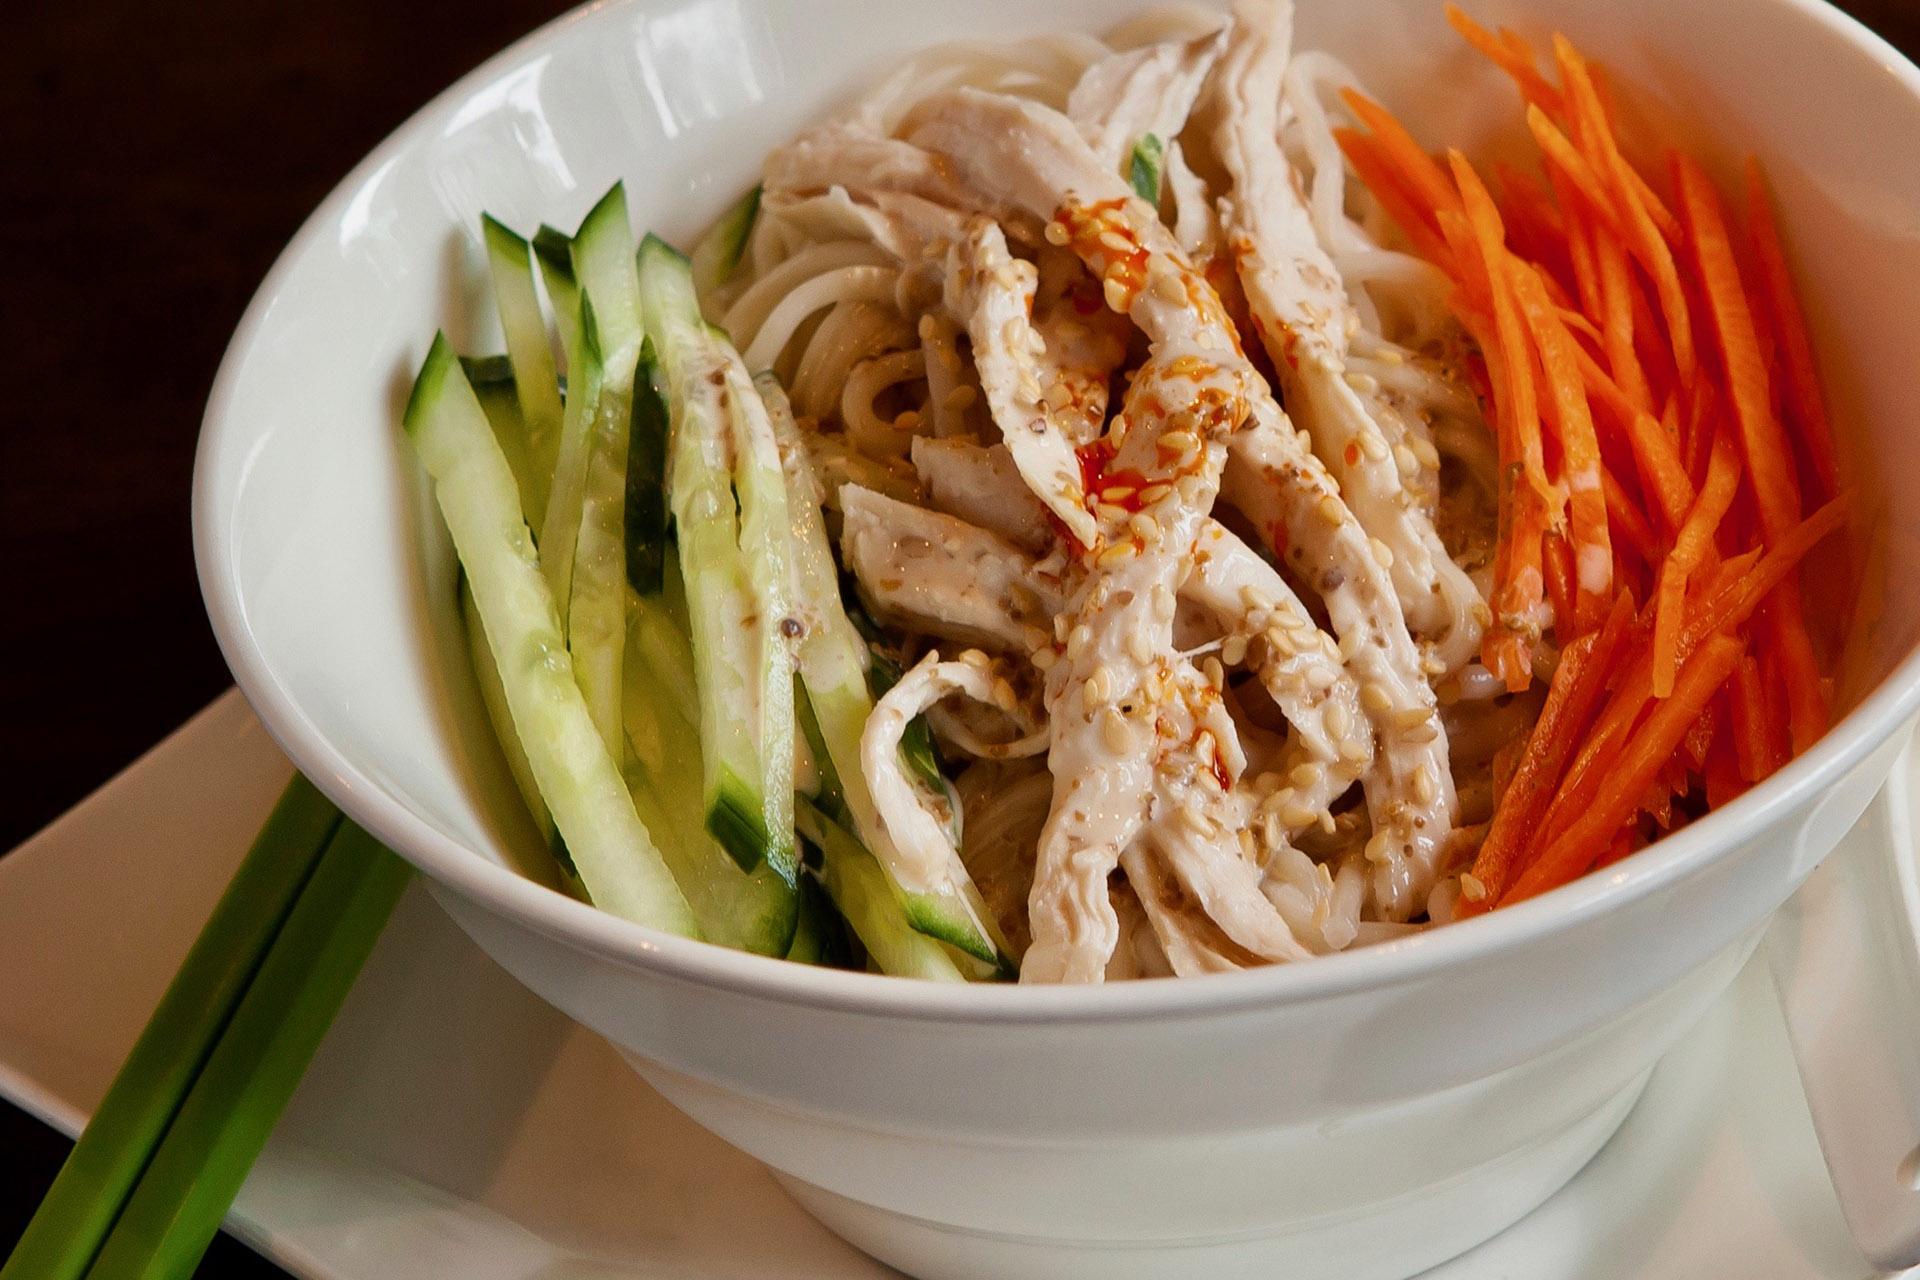 Cold Sesame-Peanut Noodles (chicken) at Lee Chen Asian Bistro